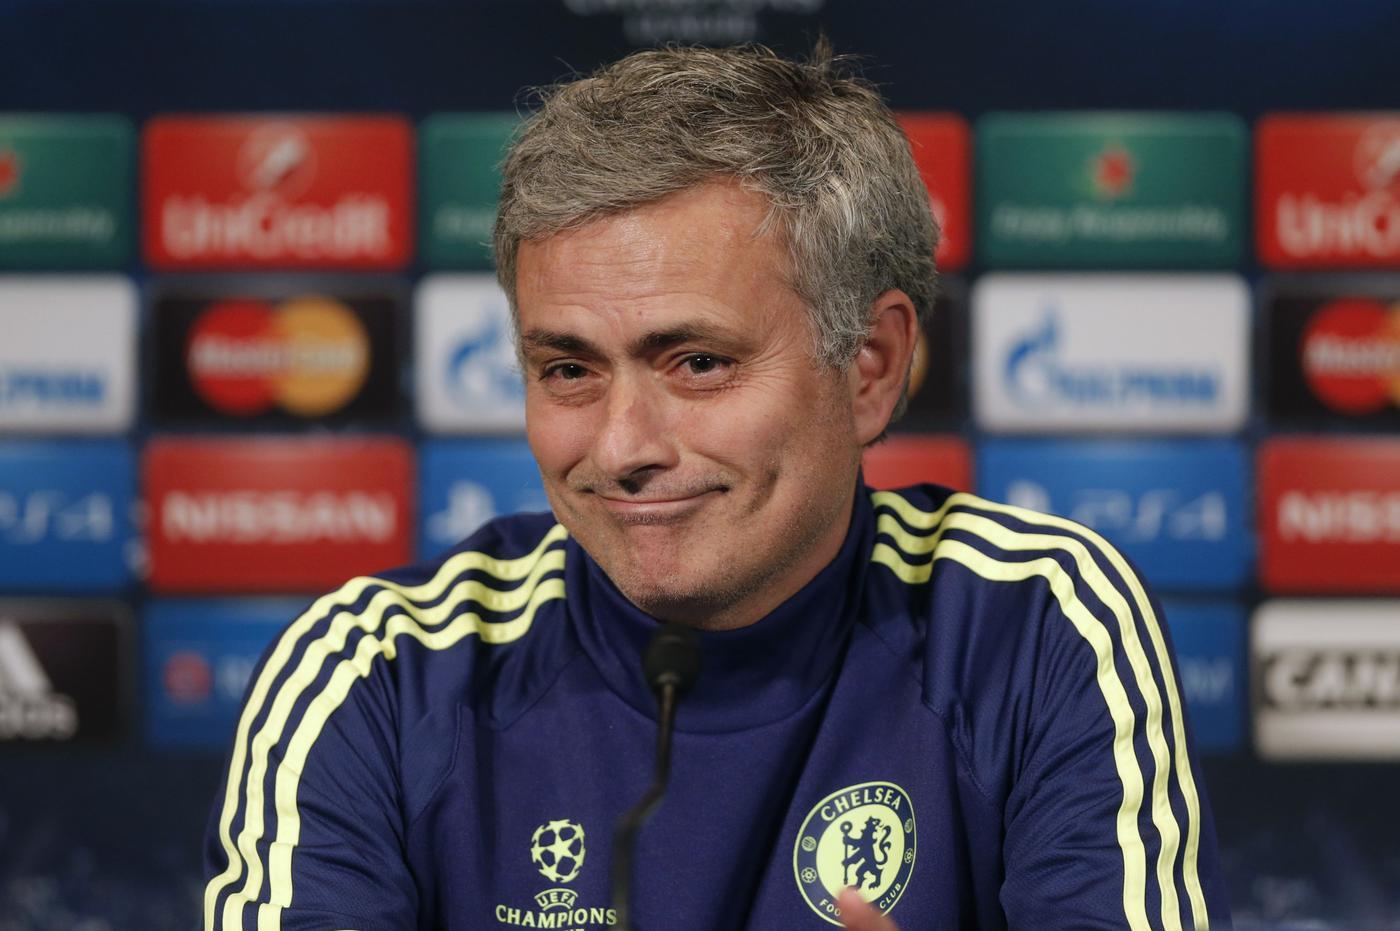 Iker Casillas 'suspects Jose Mourinho sabotaged Arsenal transfer'